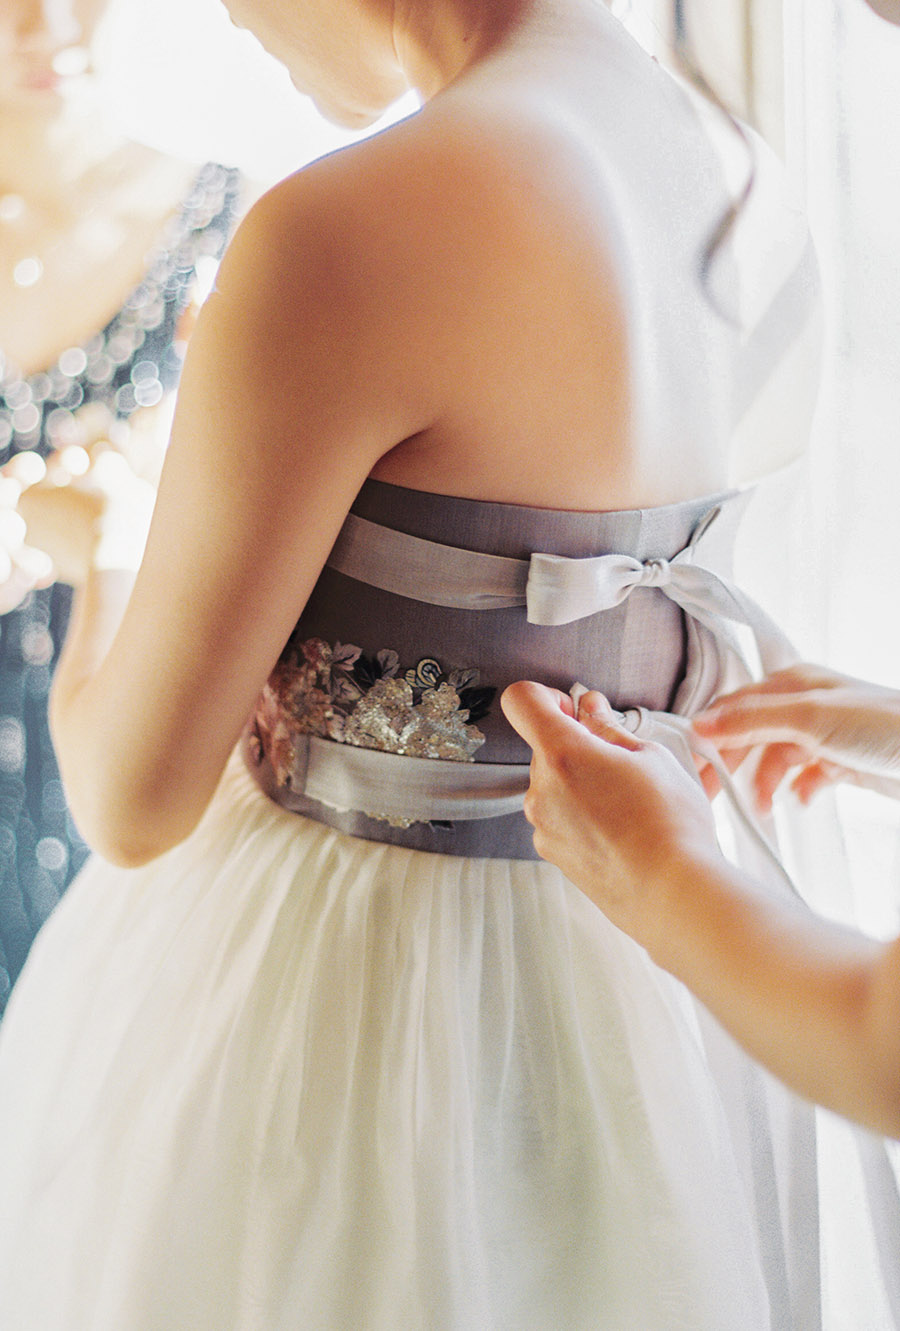 STEVEN_JOANA_YEUN_LOS_ANGELES_WEDDING_SALLY_PINERA_PHOTOGRAPHY-226.jpg